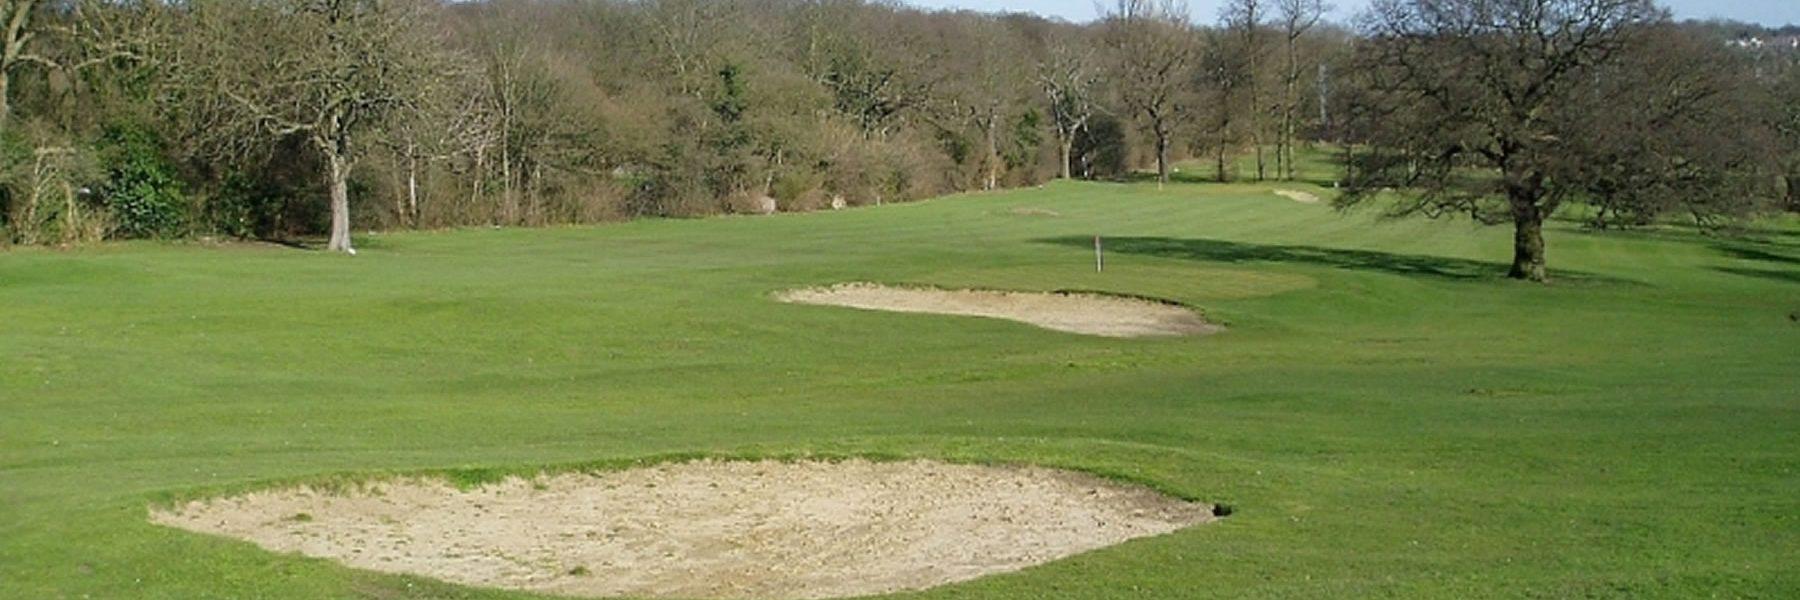 Tudor Park Barnet Course